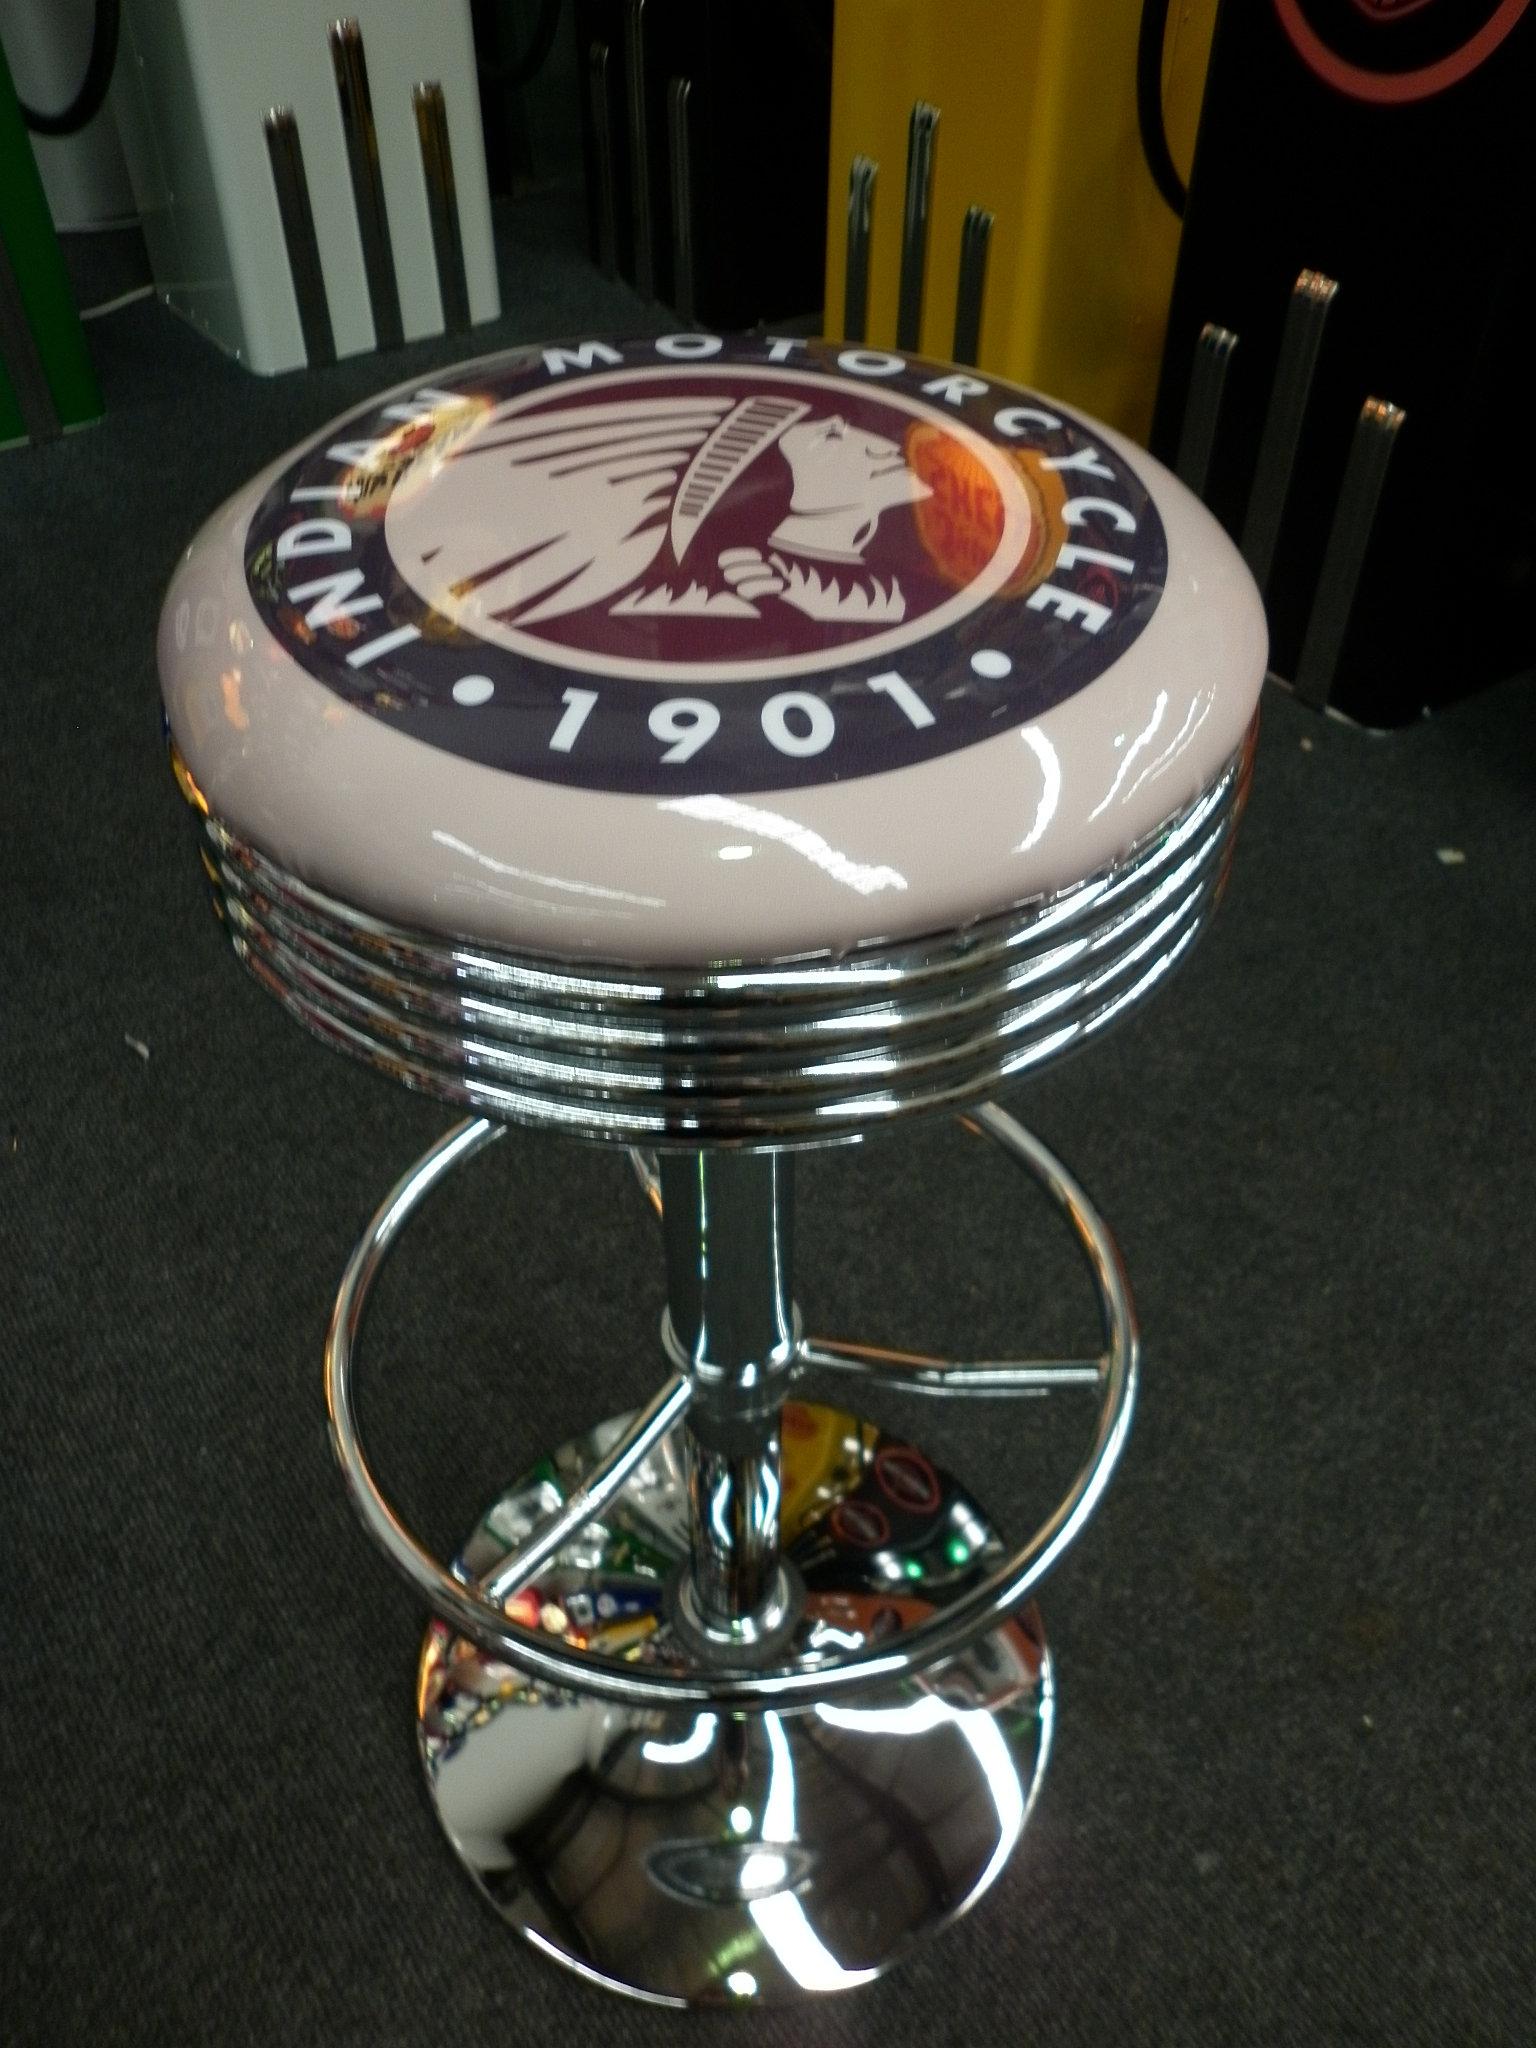 Pinball machines arcade games bar stools garage signs  : 793038441863180f3246a7bd53bf826c249b2ejpgsrz1536204885220501200 from www.mancavemadness.com size 1536 x 2048 jpeg 356kB